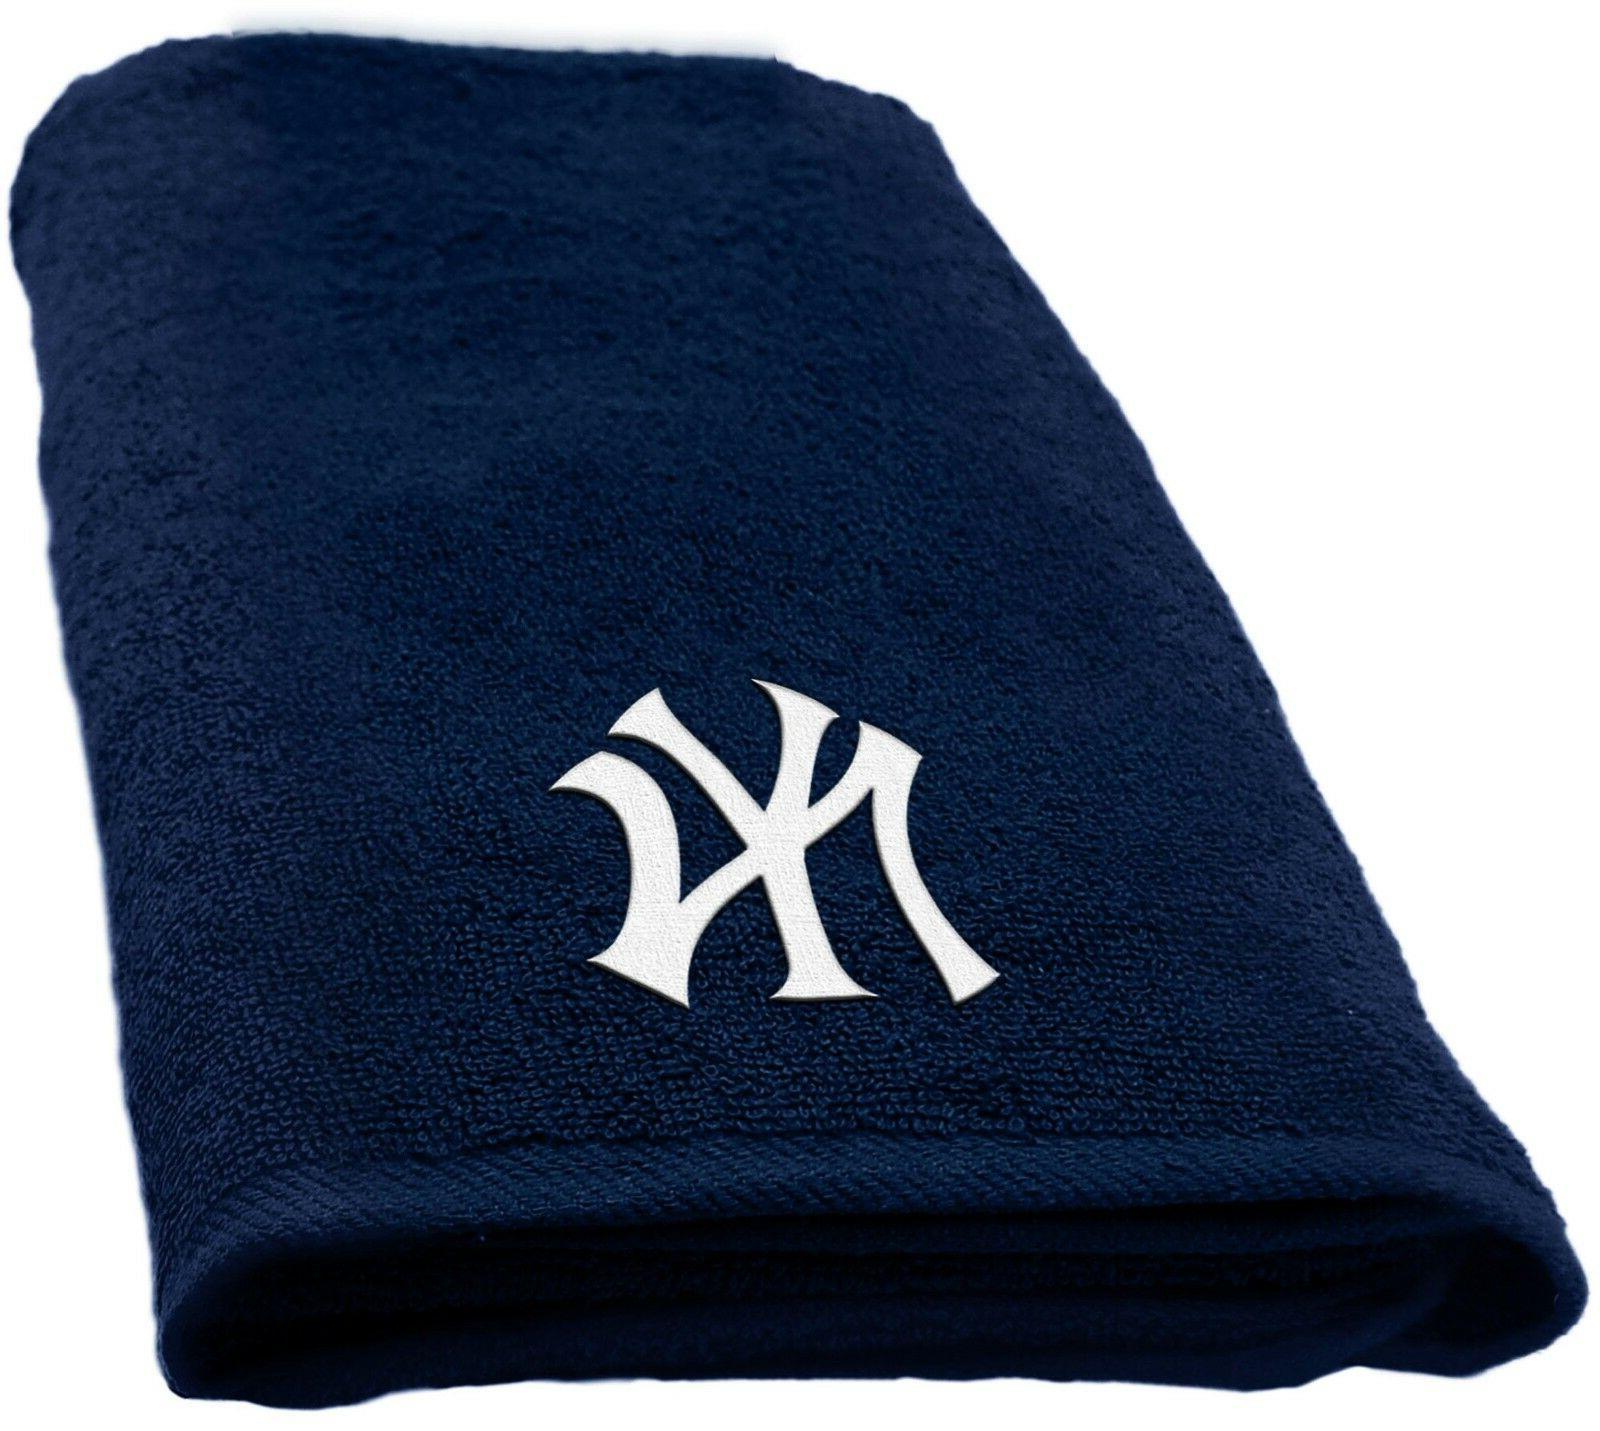 "MLB New York Yankees 15""x26"" Applique Hand Towel"